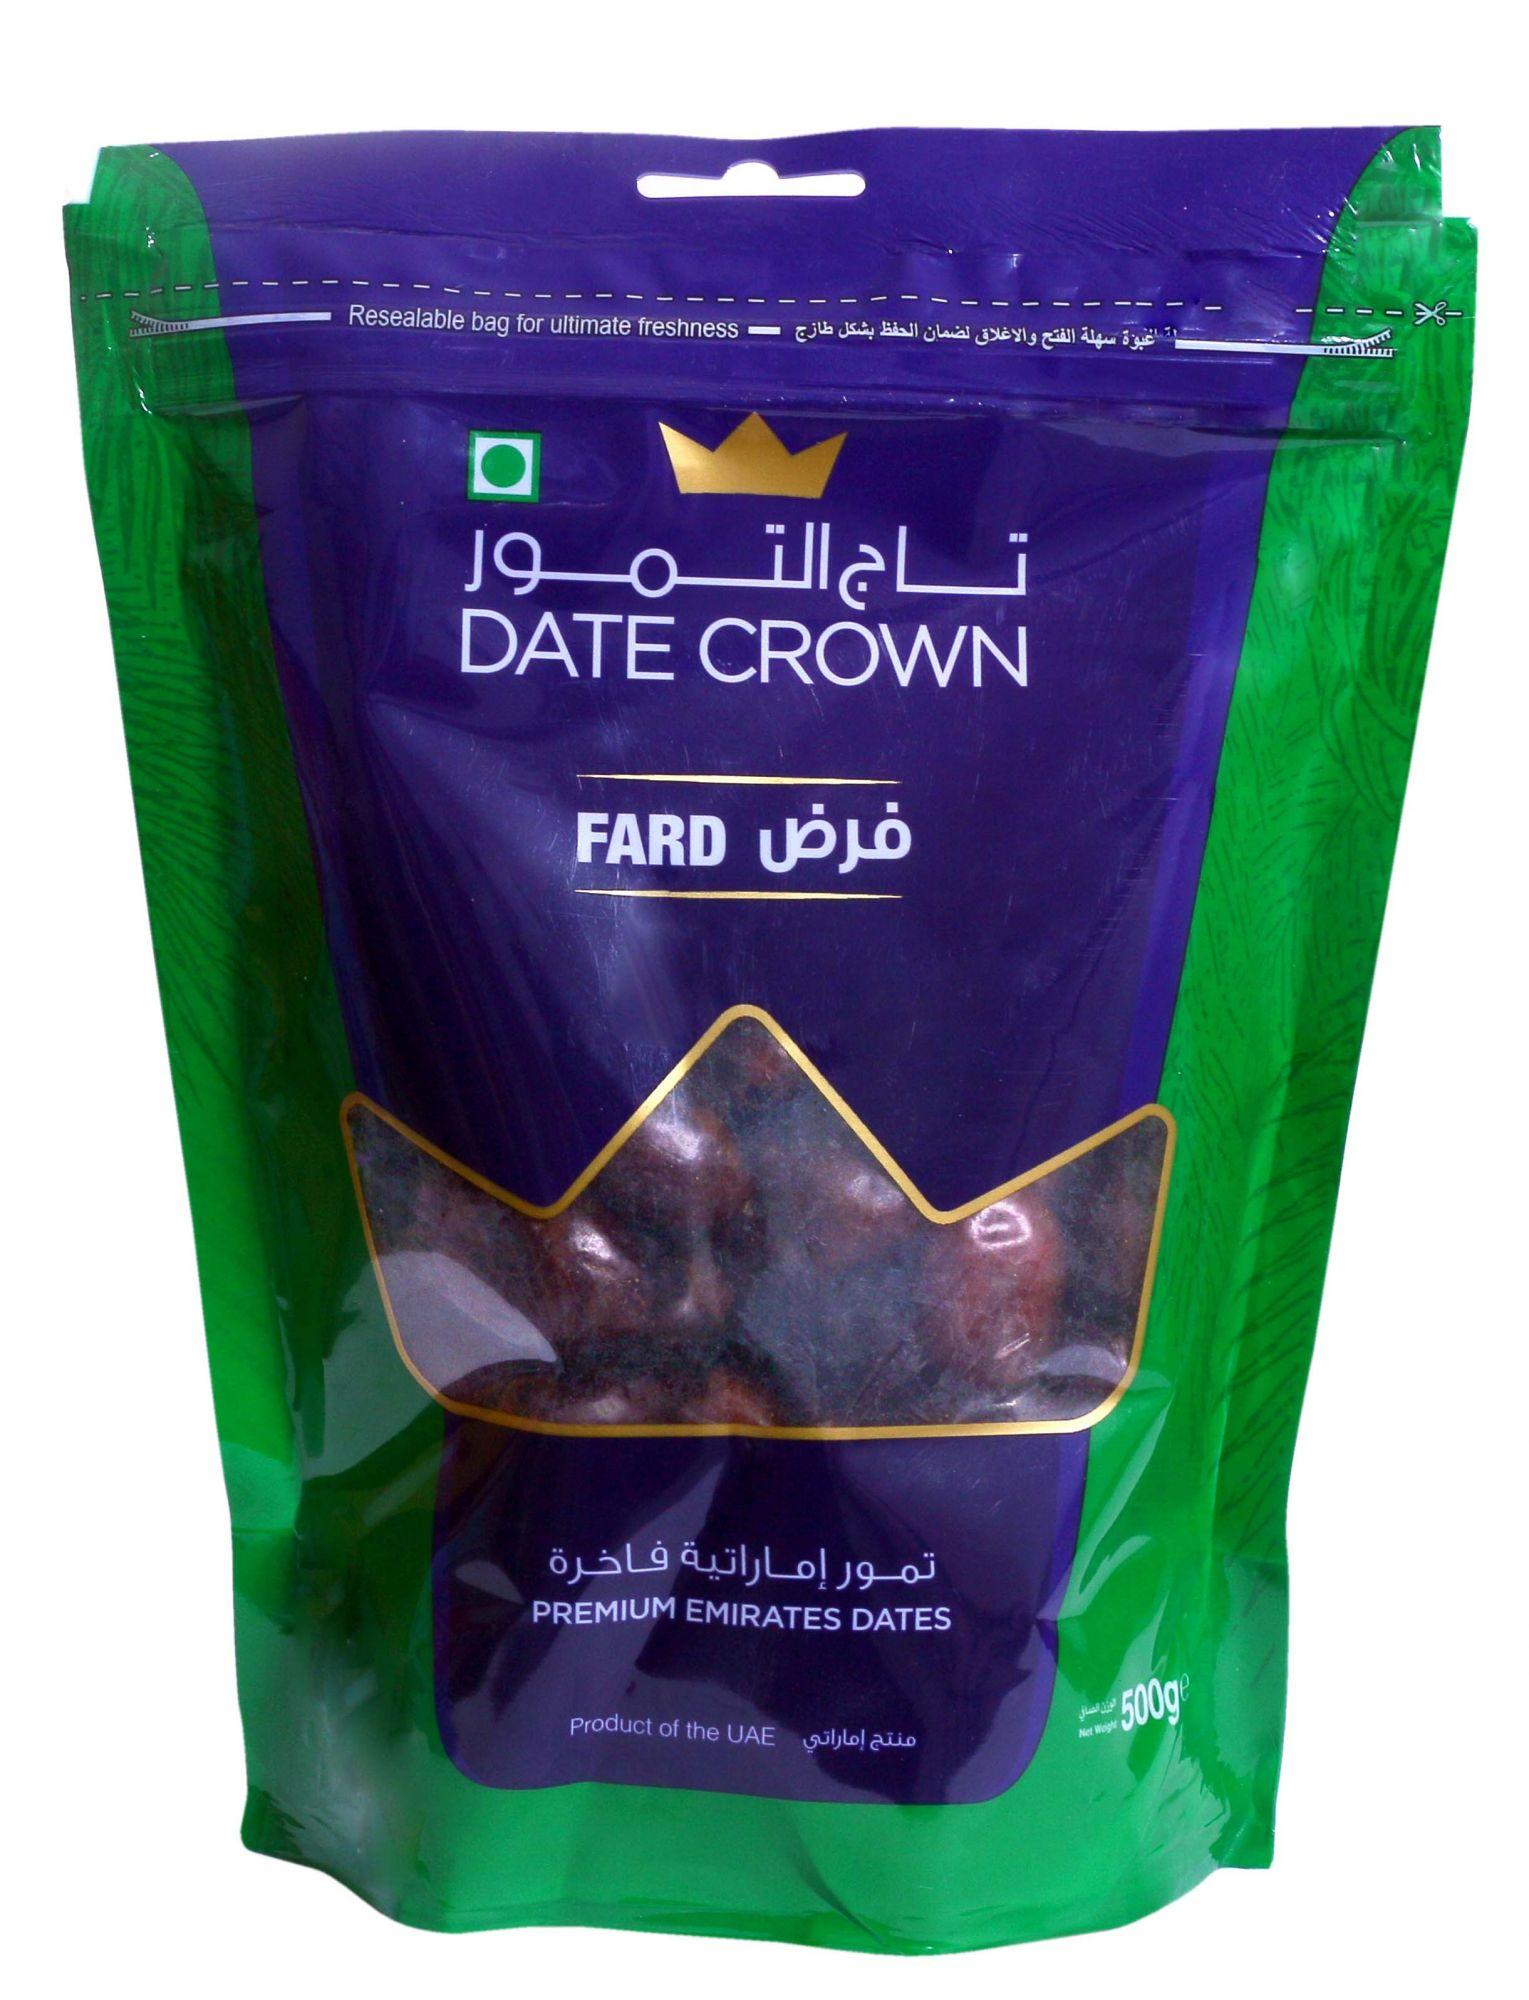 Date Crown farad Dates 500g